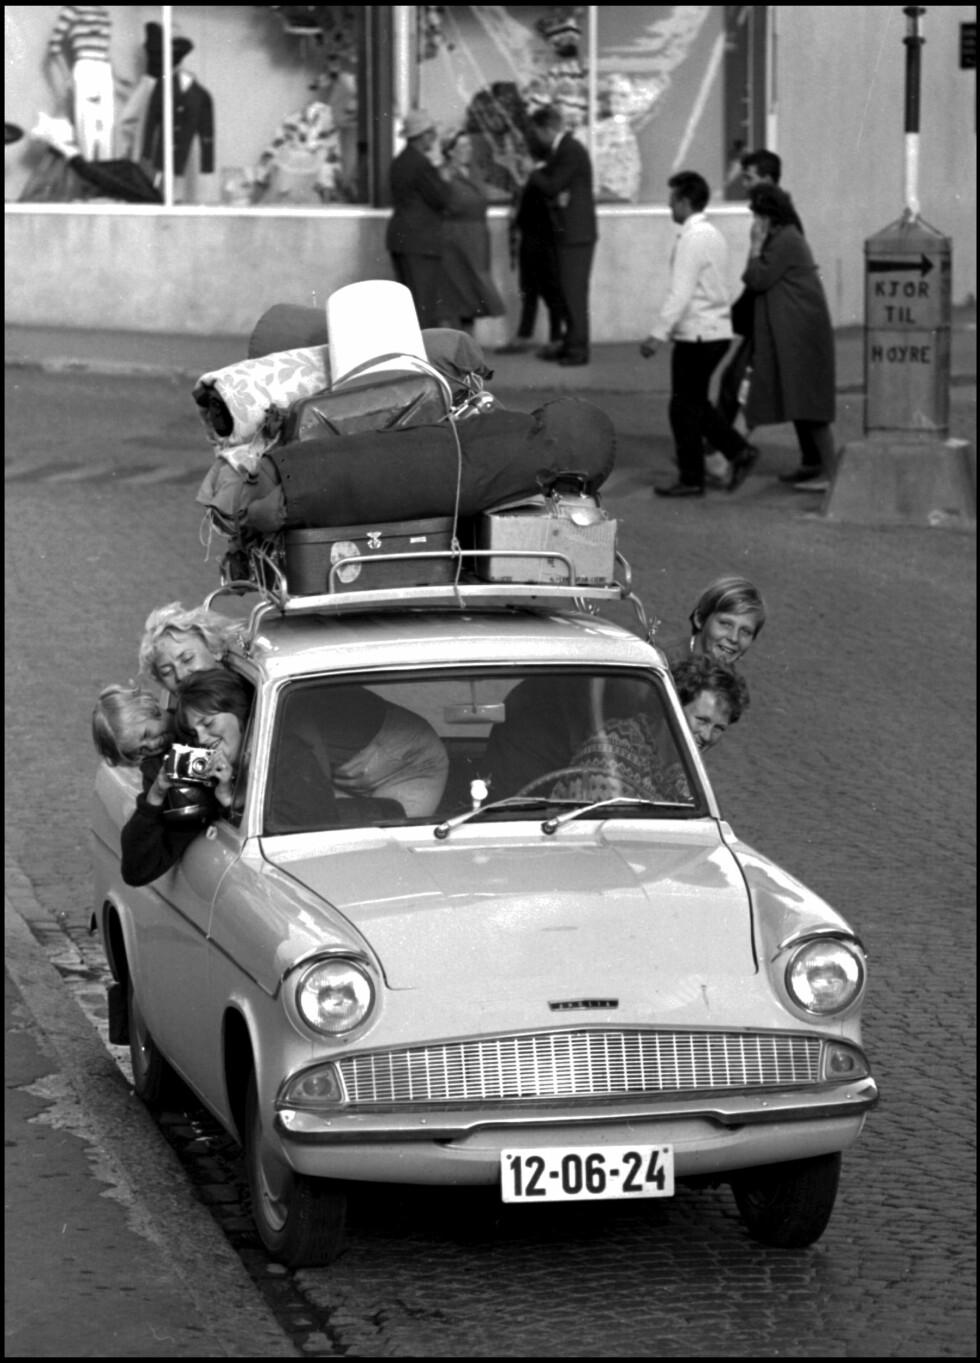 POPULÆR FERIEFORM: Bilferie har vært populært blant nordmenn lenge. Her er en fullpakket og ferieklar familie fra 1968. Foto: NTB SCANPIX